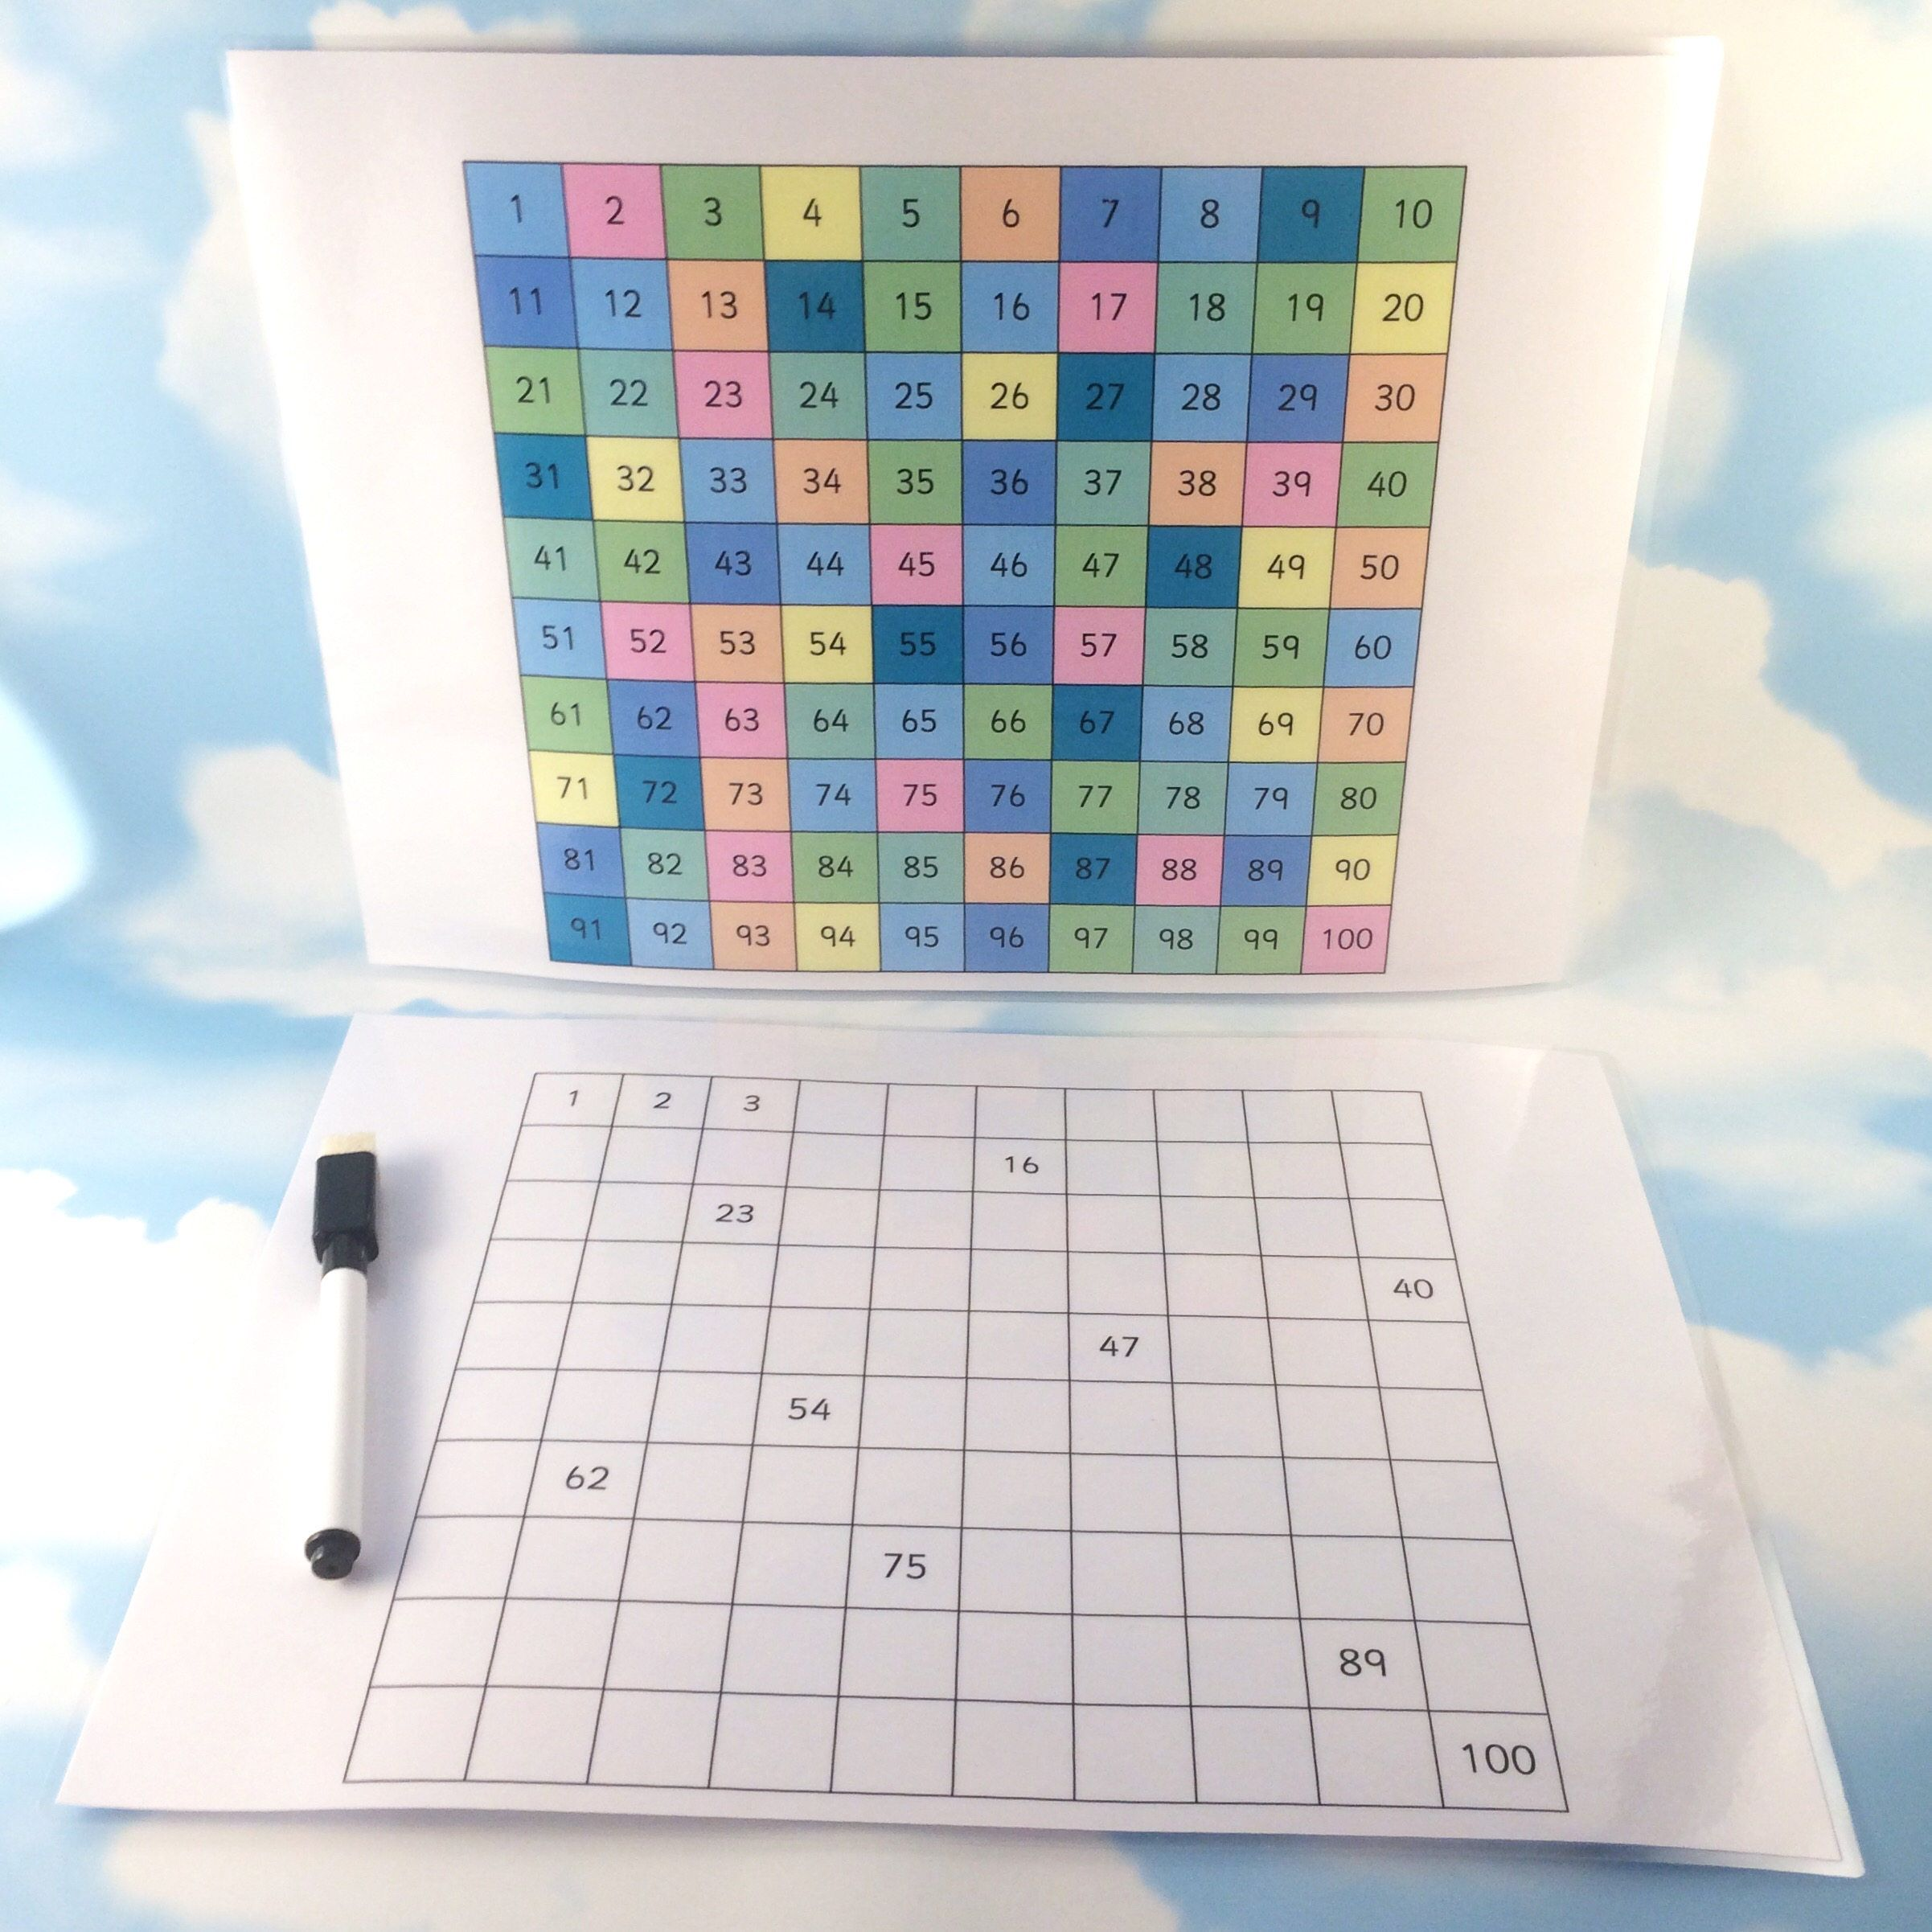 30 Worksheets Coloring A Grid 2 Reginald Penhorst